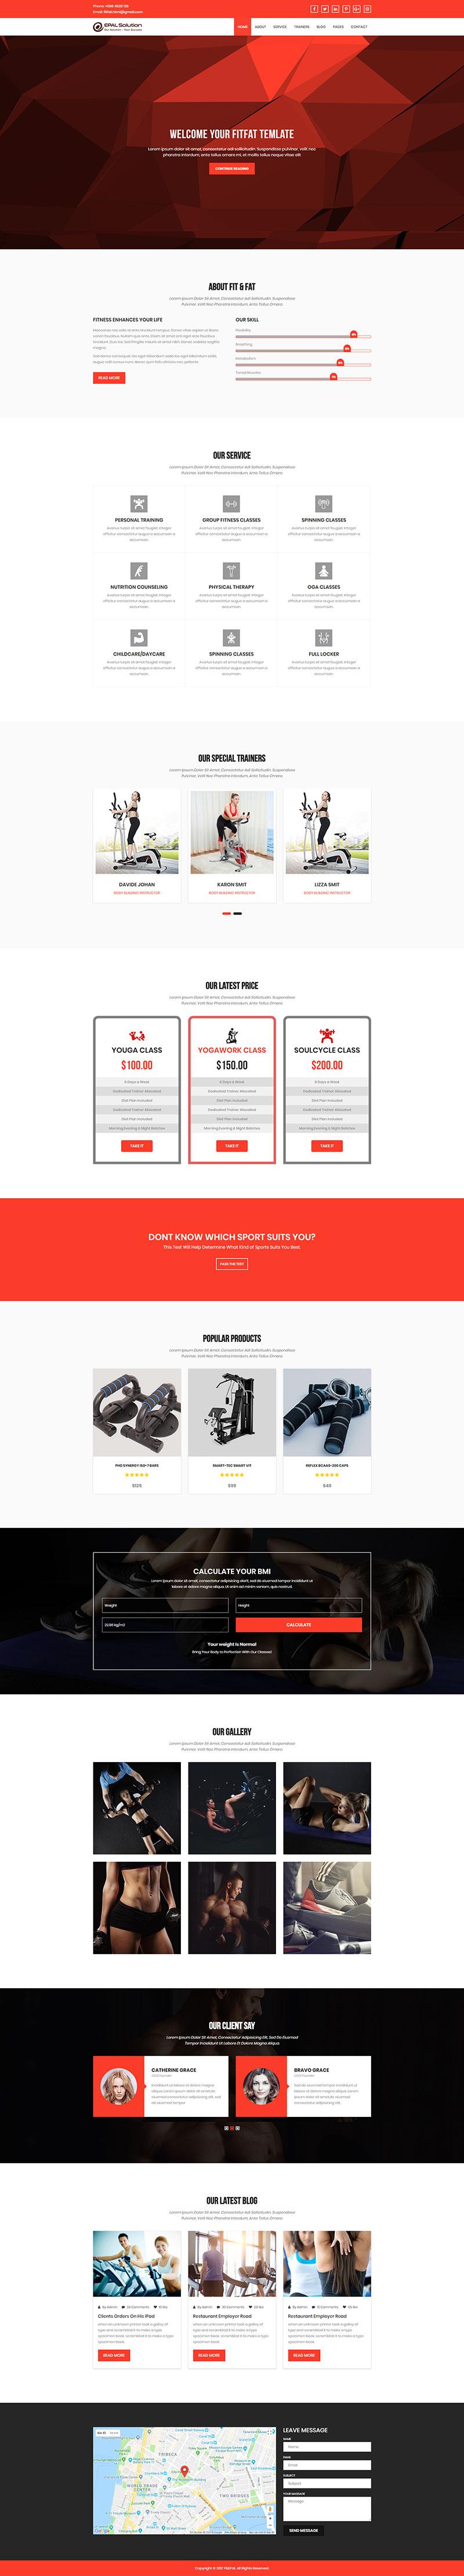 Mẫu Web Game Fit & Fat / G9876